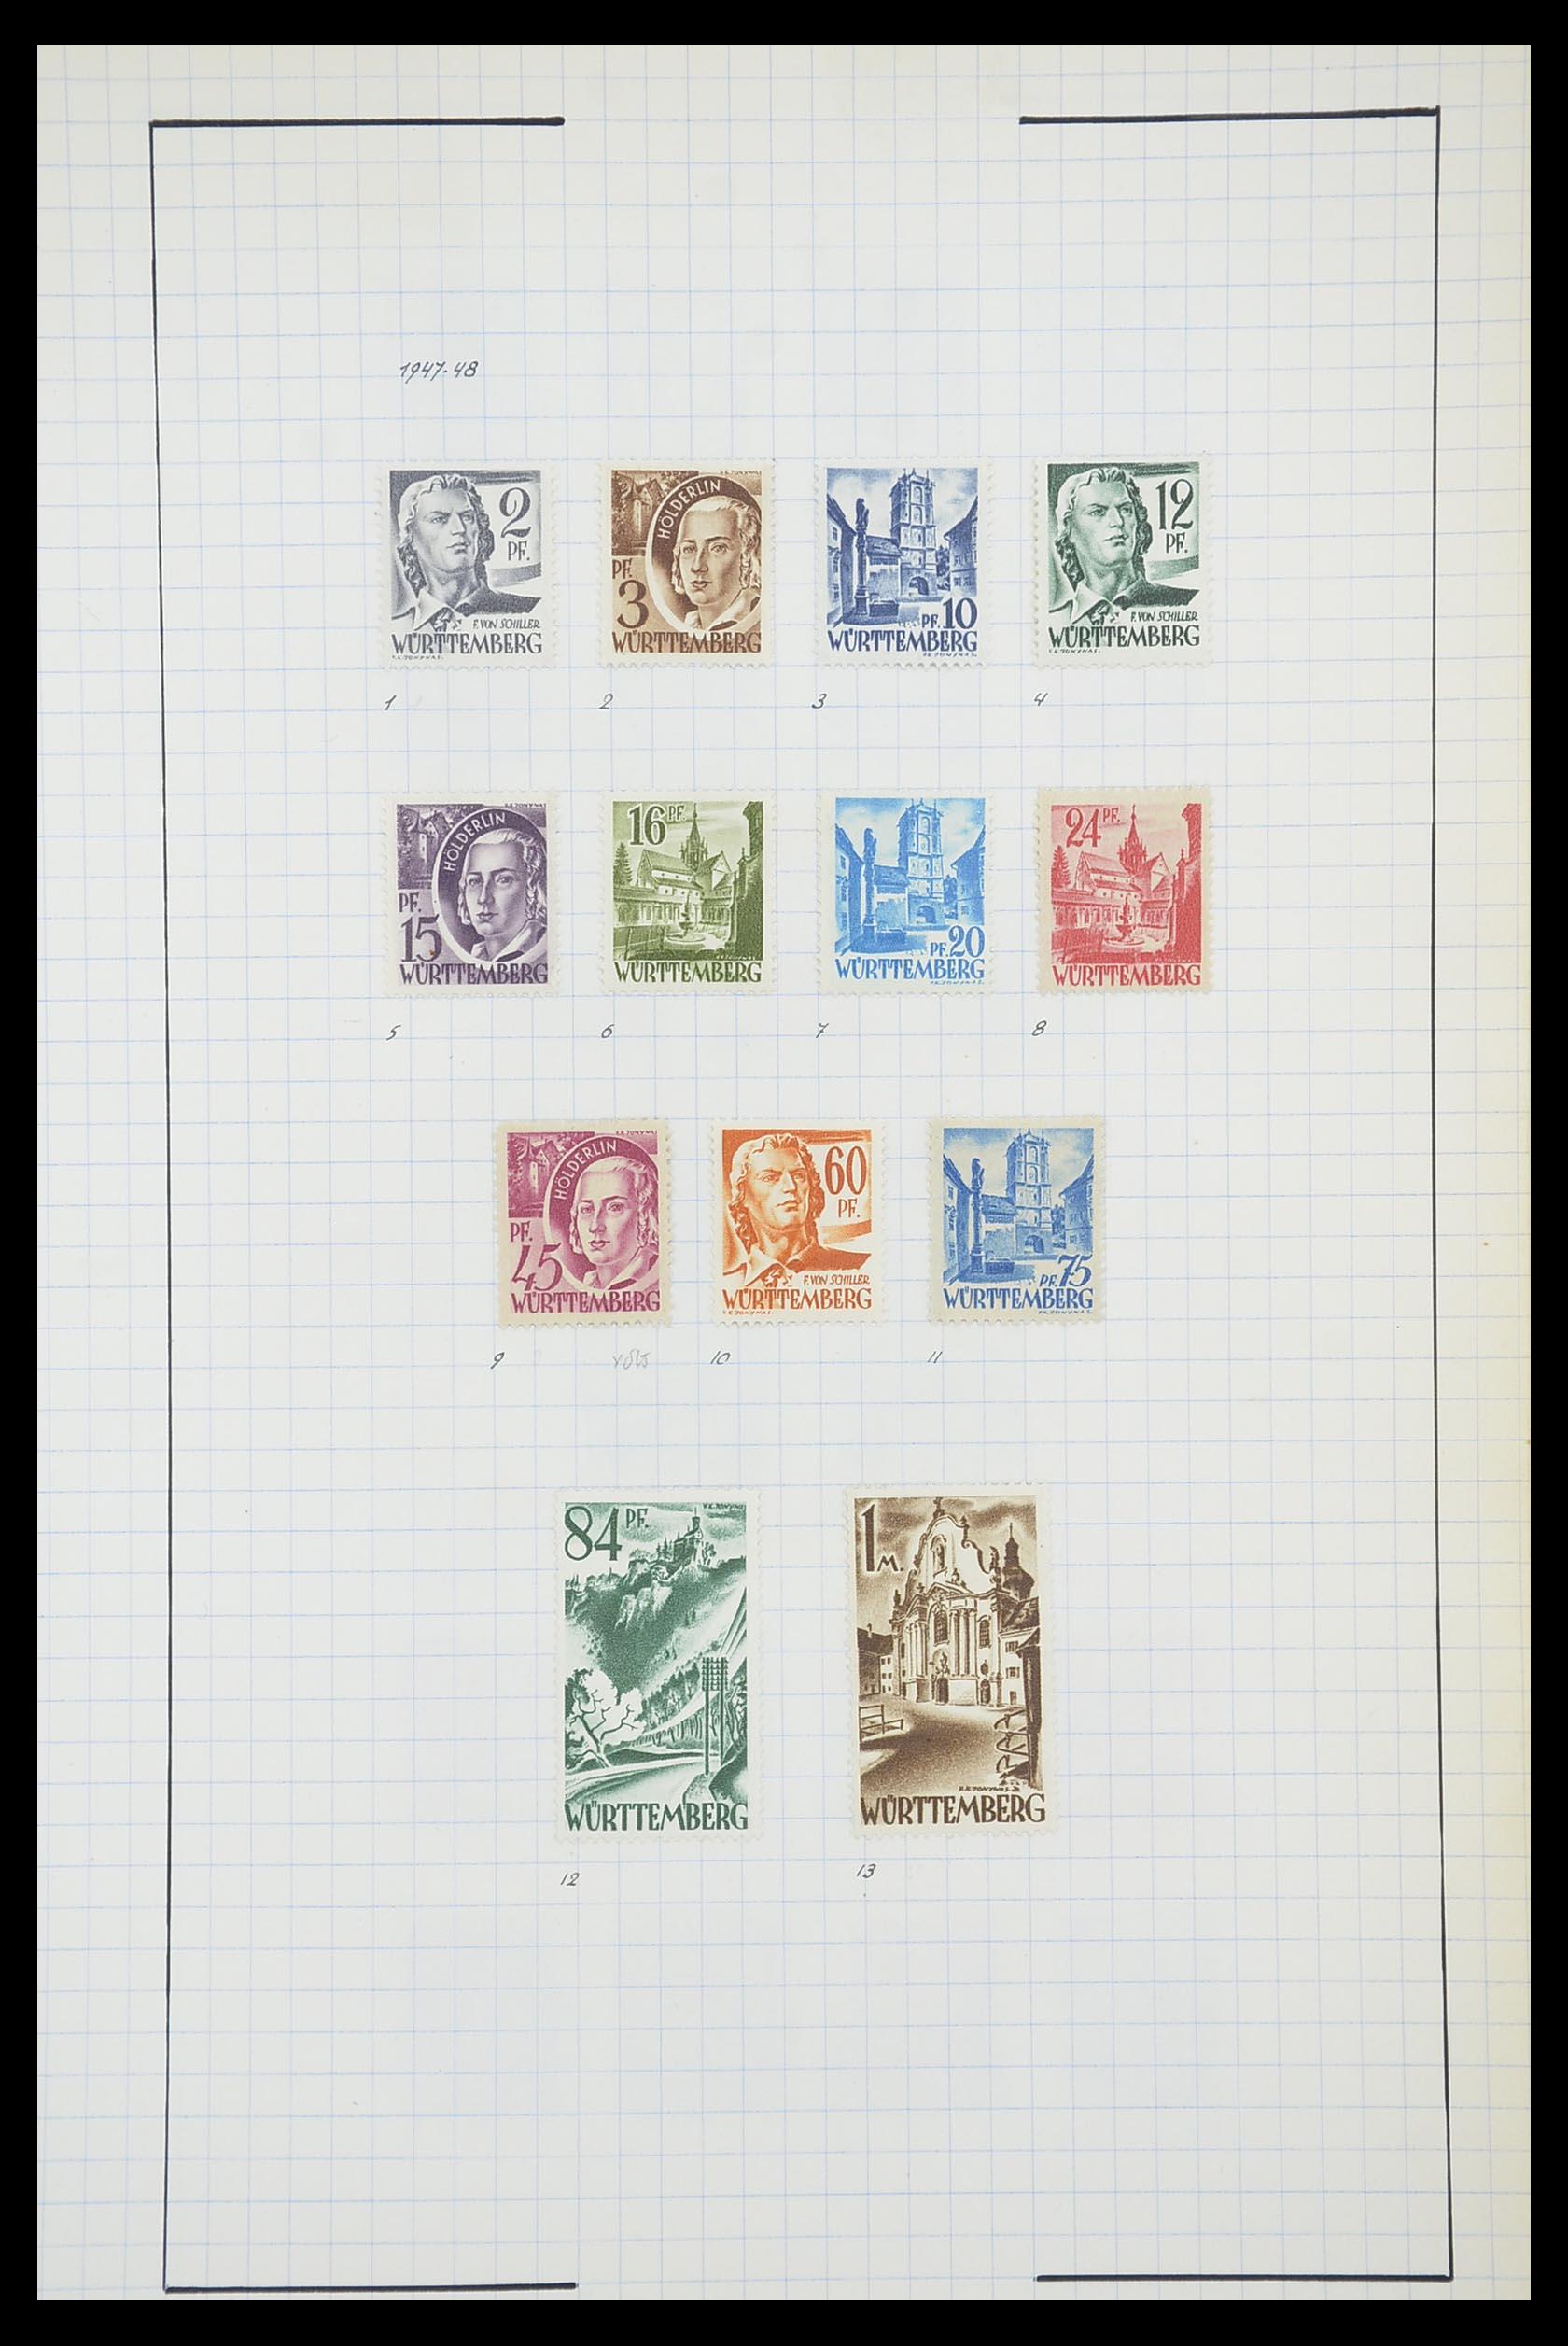 33864 019 - Postzegelverzameling 33864 Franse Zone 1945-1949.